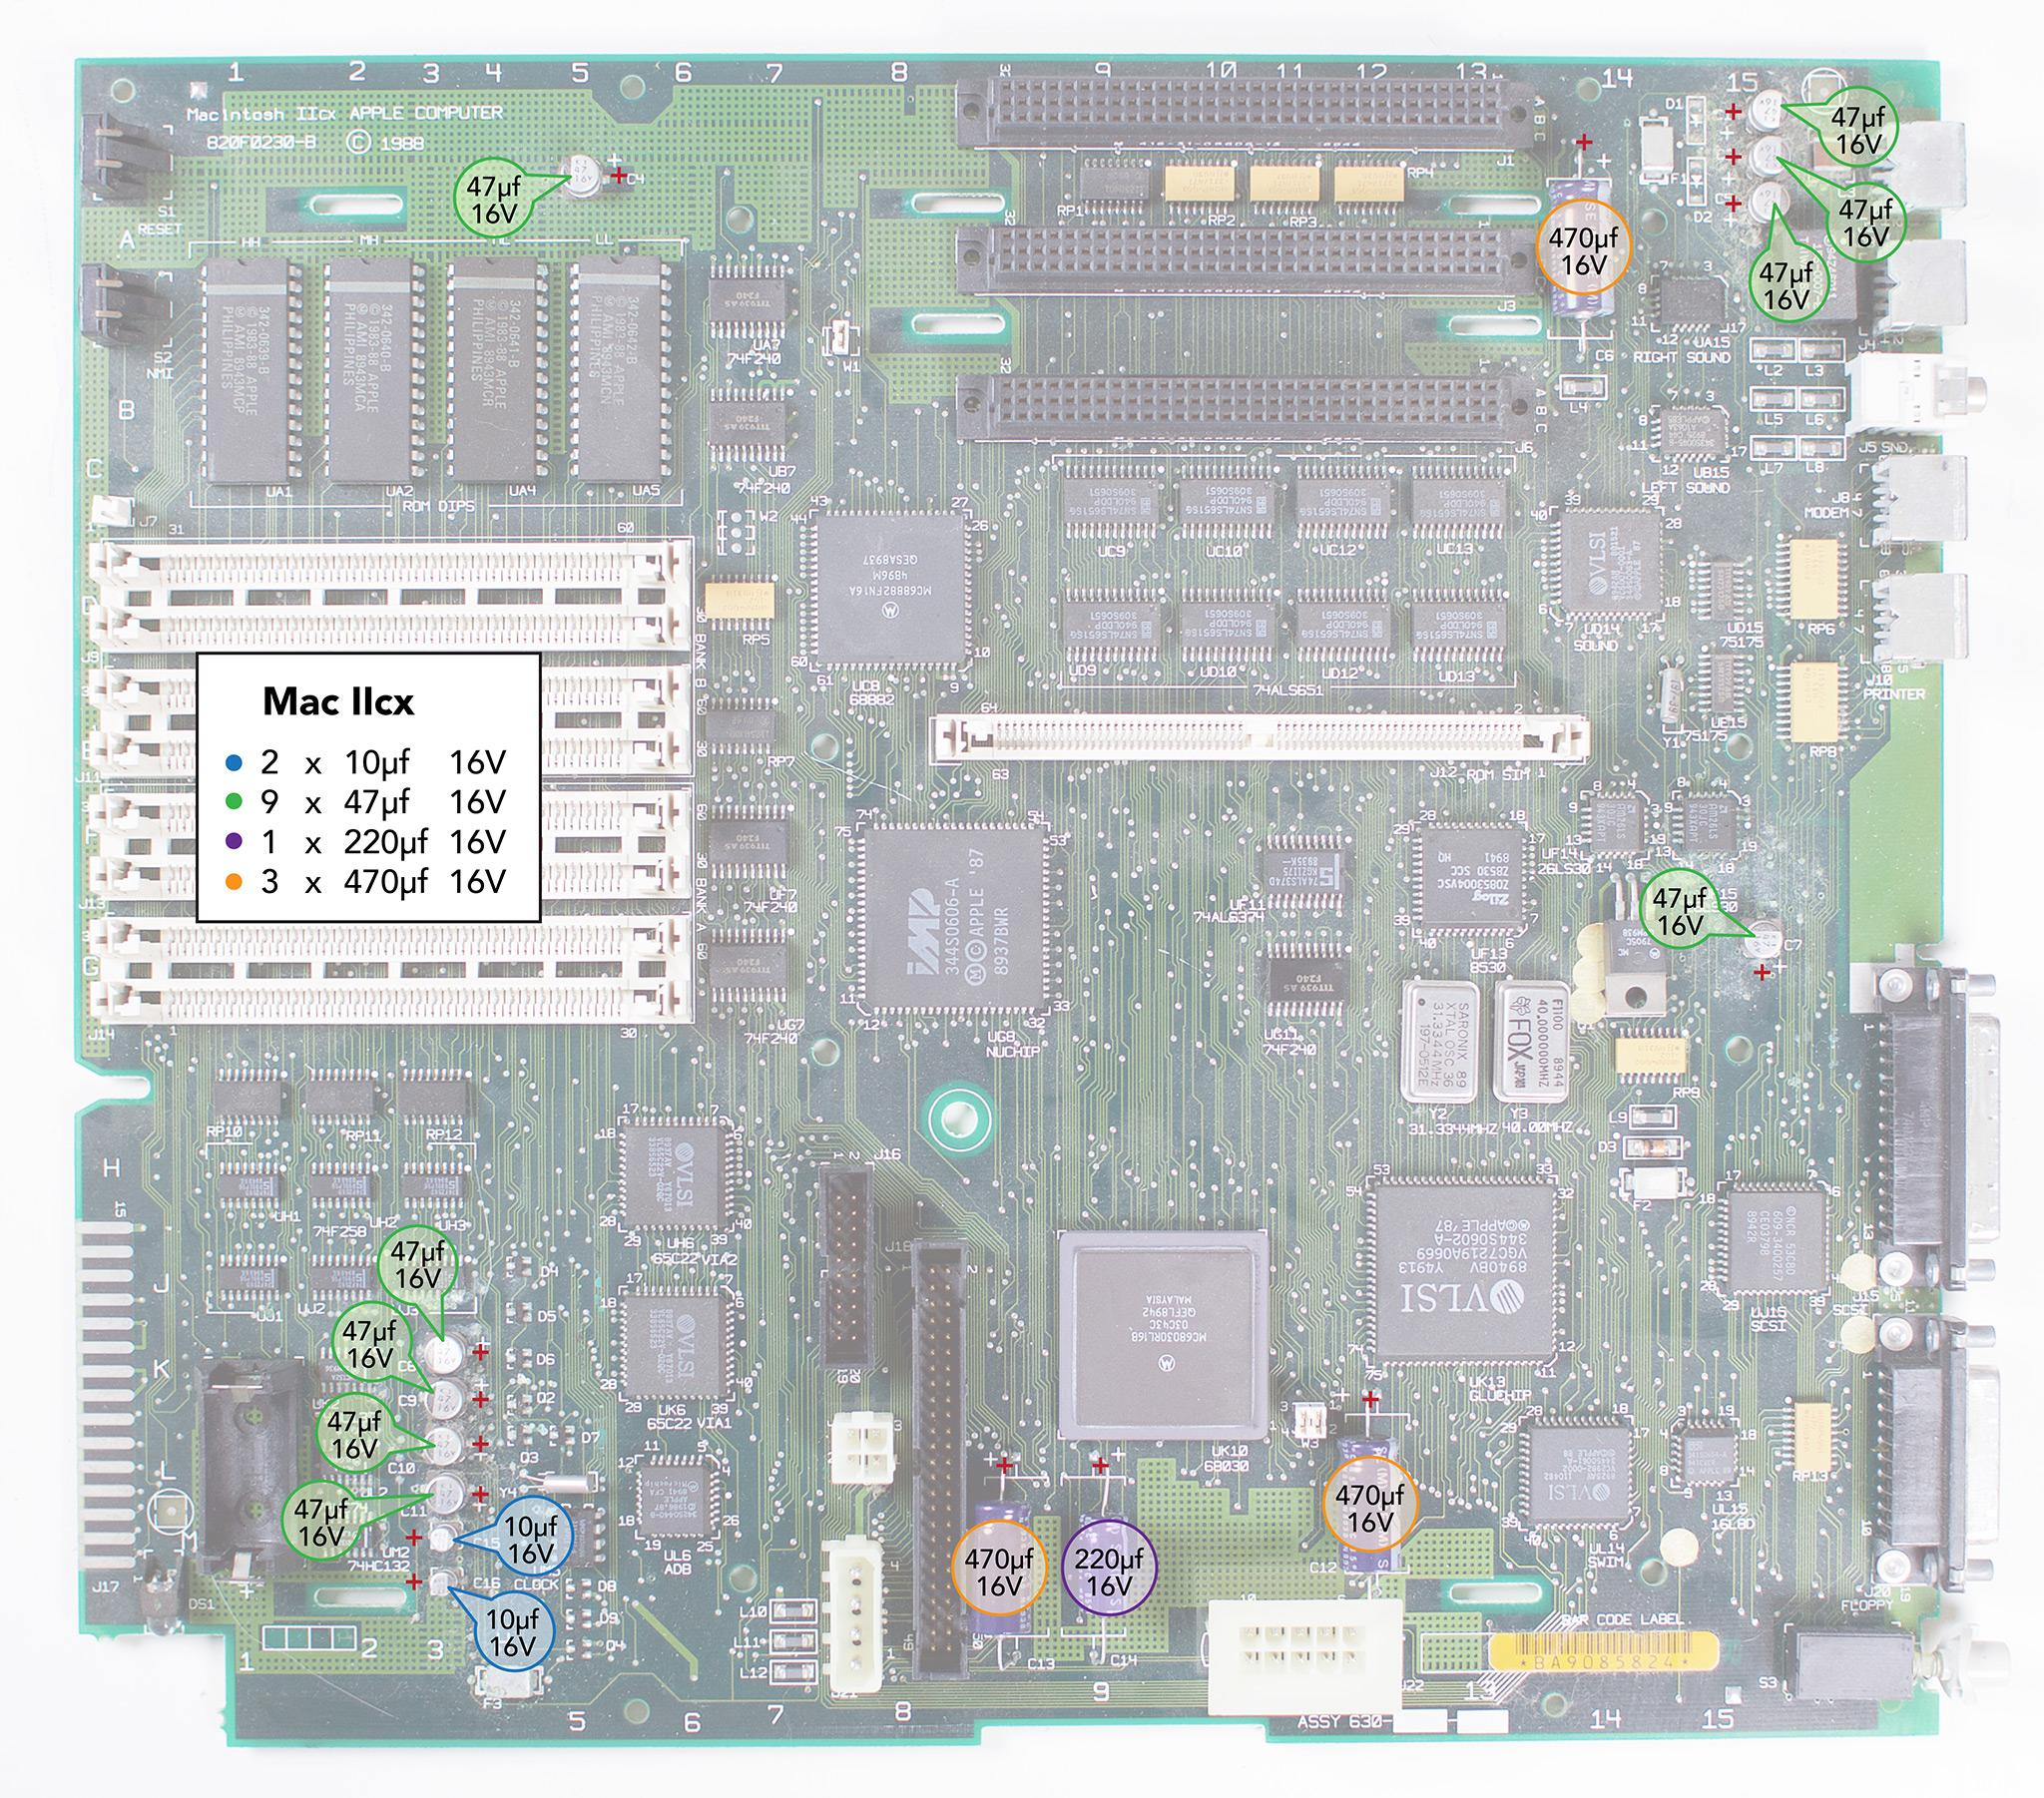 Macintosh IIcx Recapping Guide